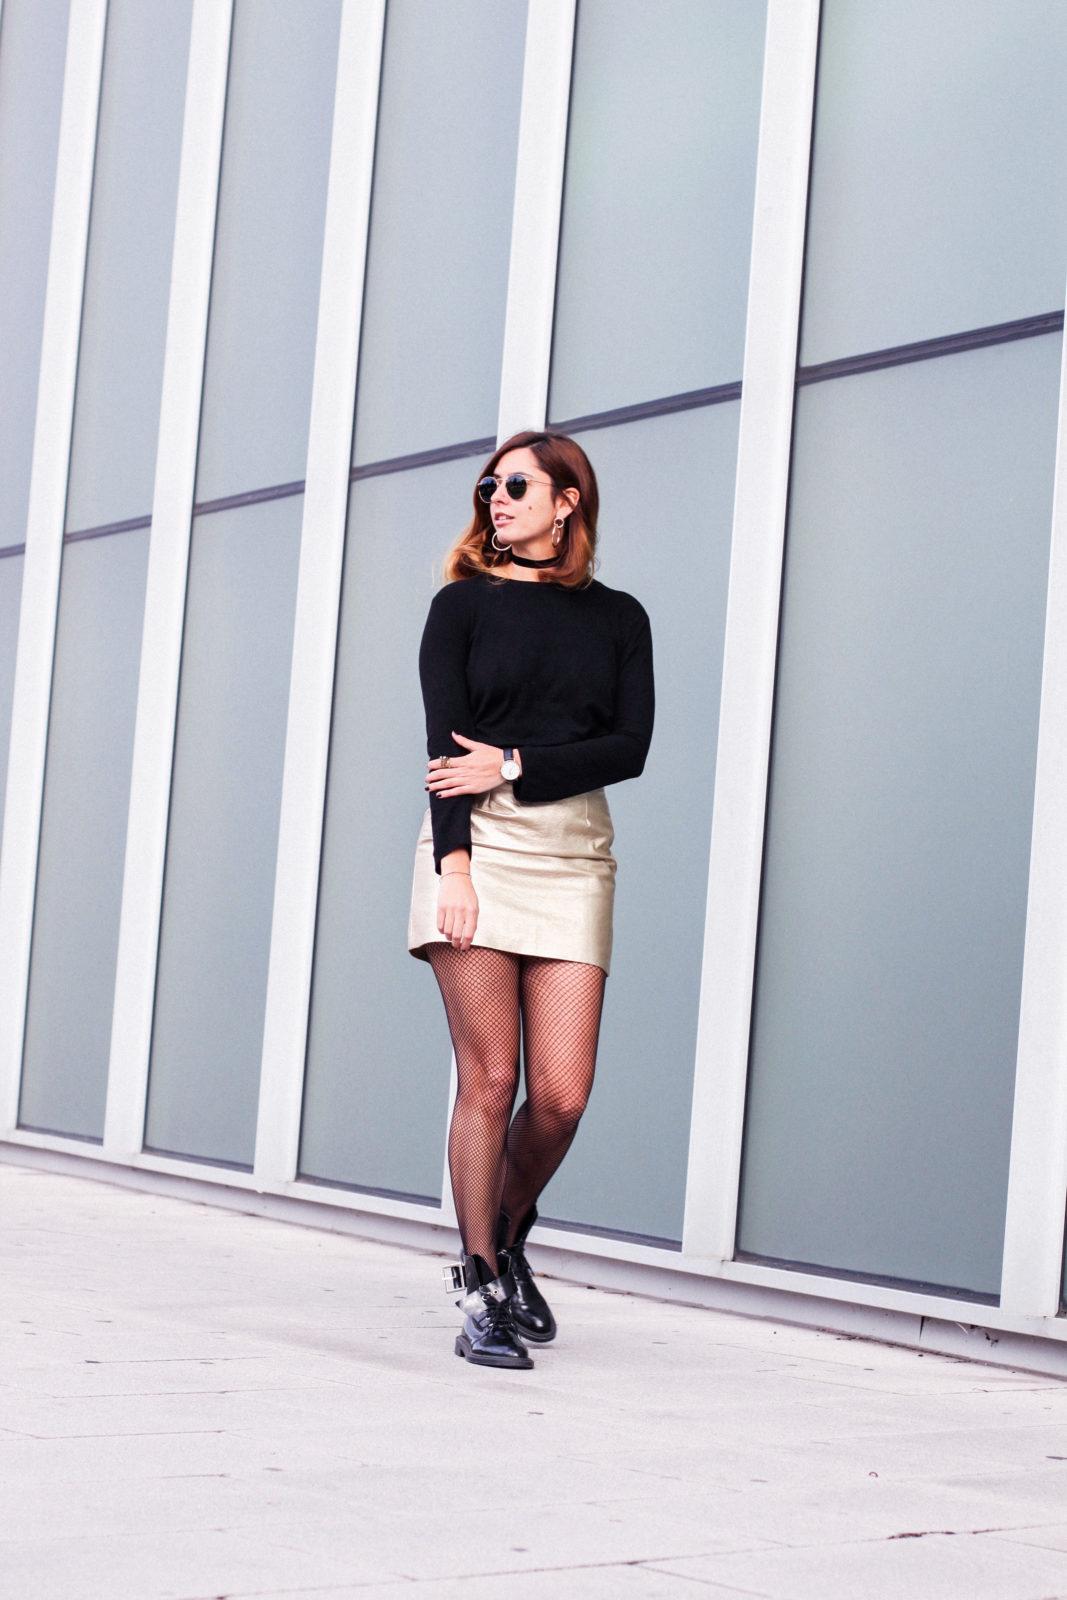 falda_dorada_shein_metalizado_medias_de_rejilla_choker_donkeycool_street_style_trends_2016-41